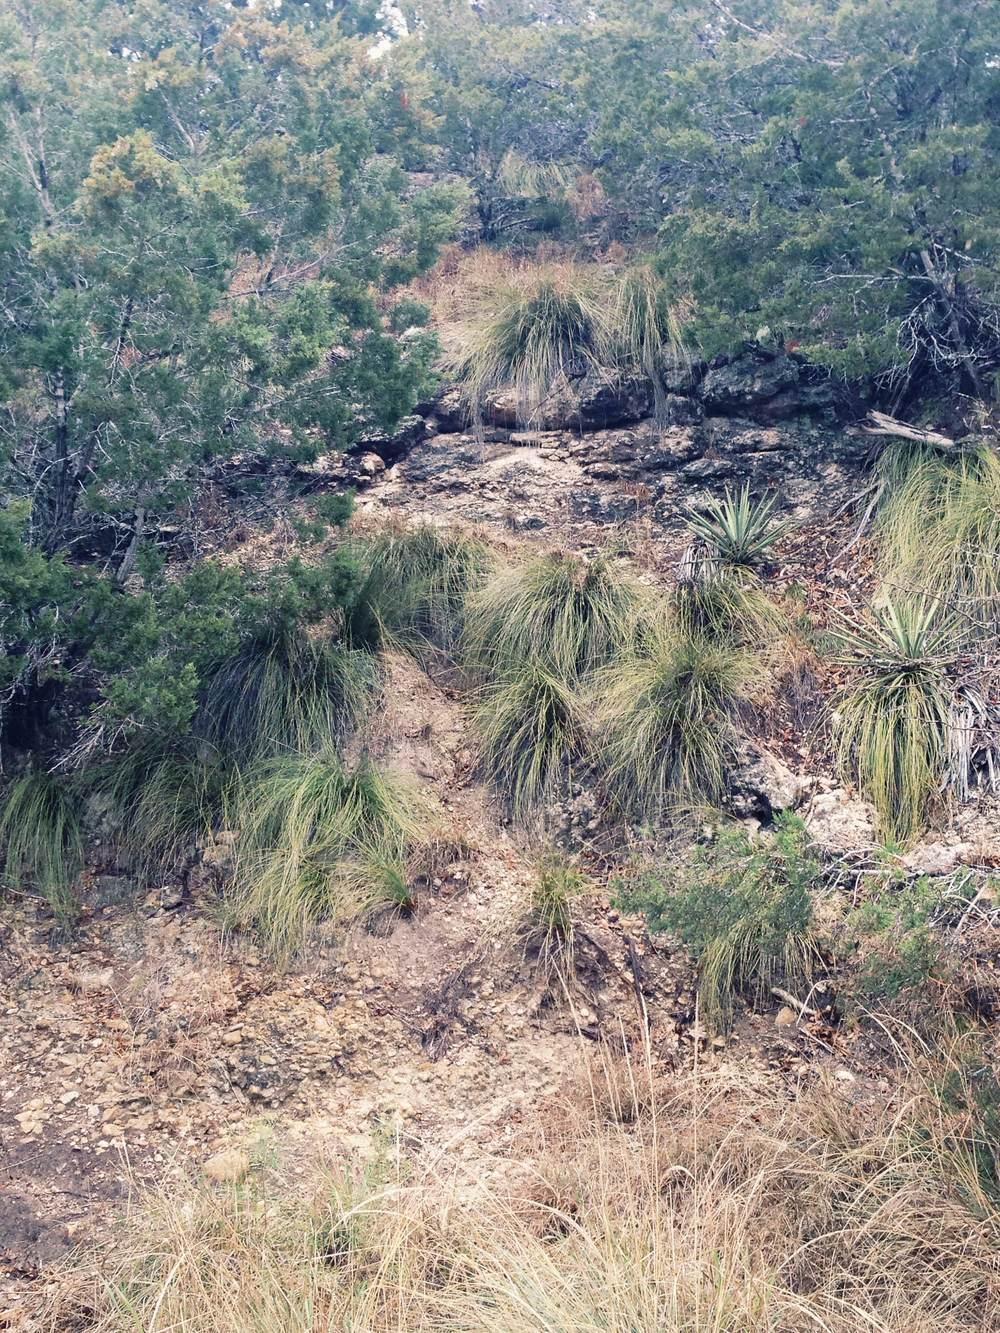 Plant: Nolina texana, Sacahuista | Location: Double Eagle Ranch, Burnet Co., Texas